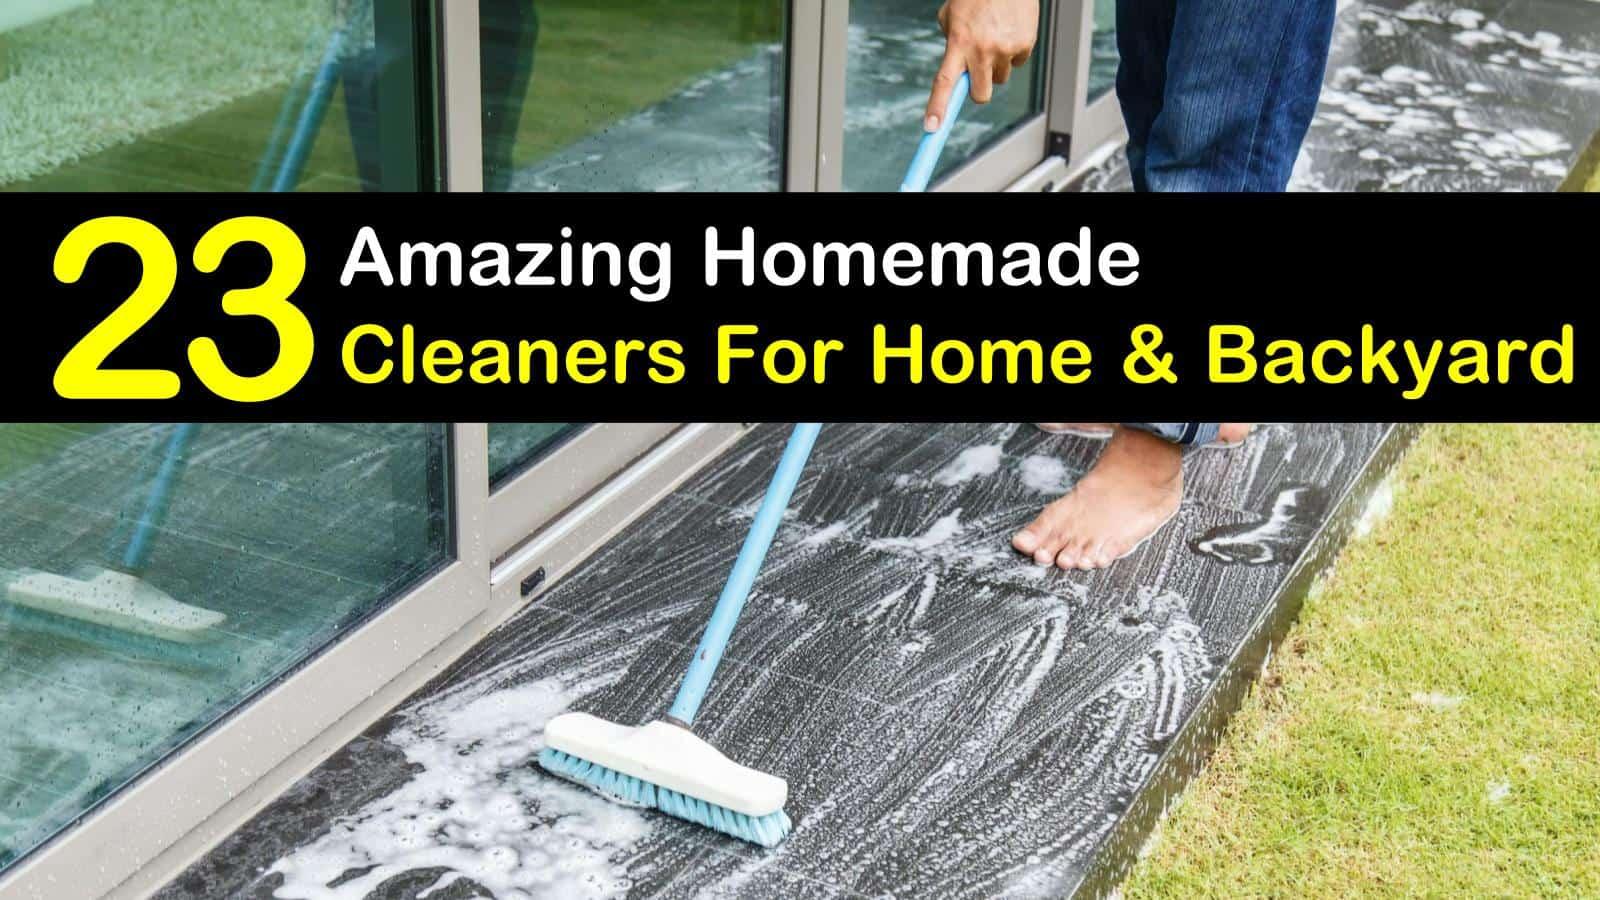 homemade cleaners titleimg1